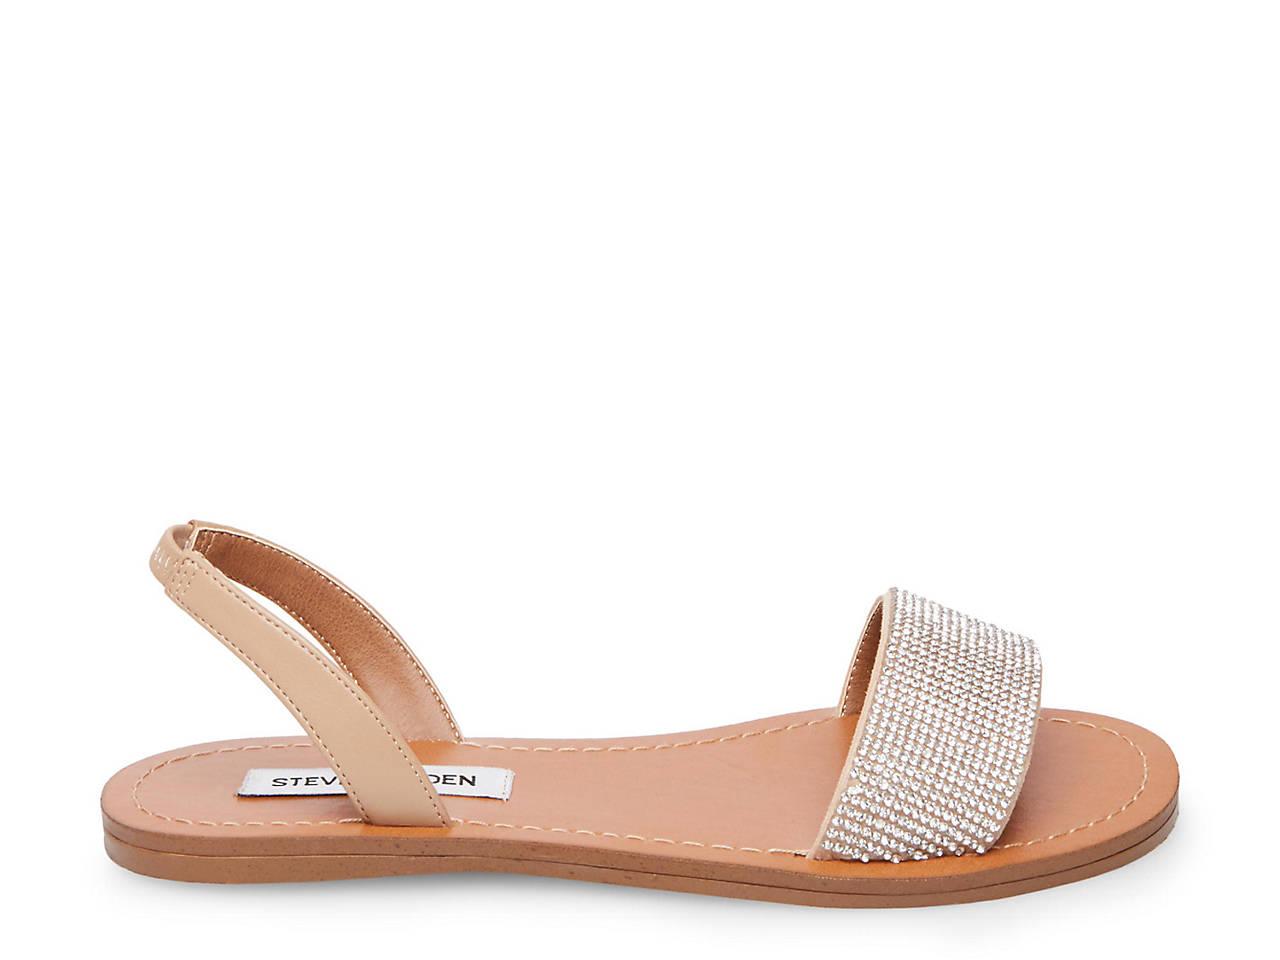 31479846853e Steve Madden Rock Flat Sandal Women s Shoes